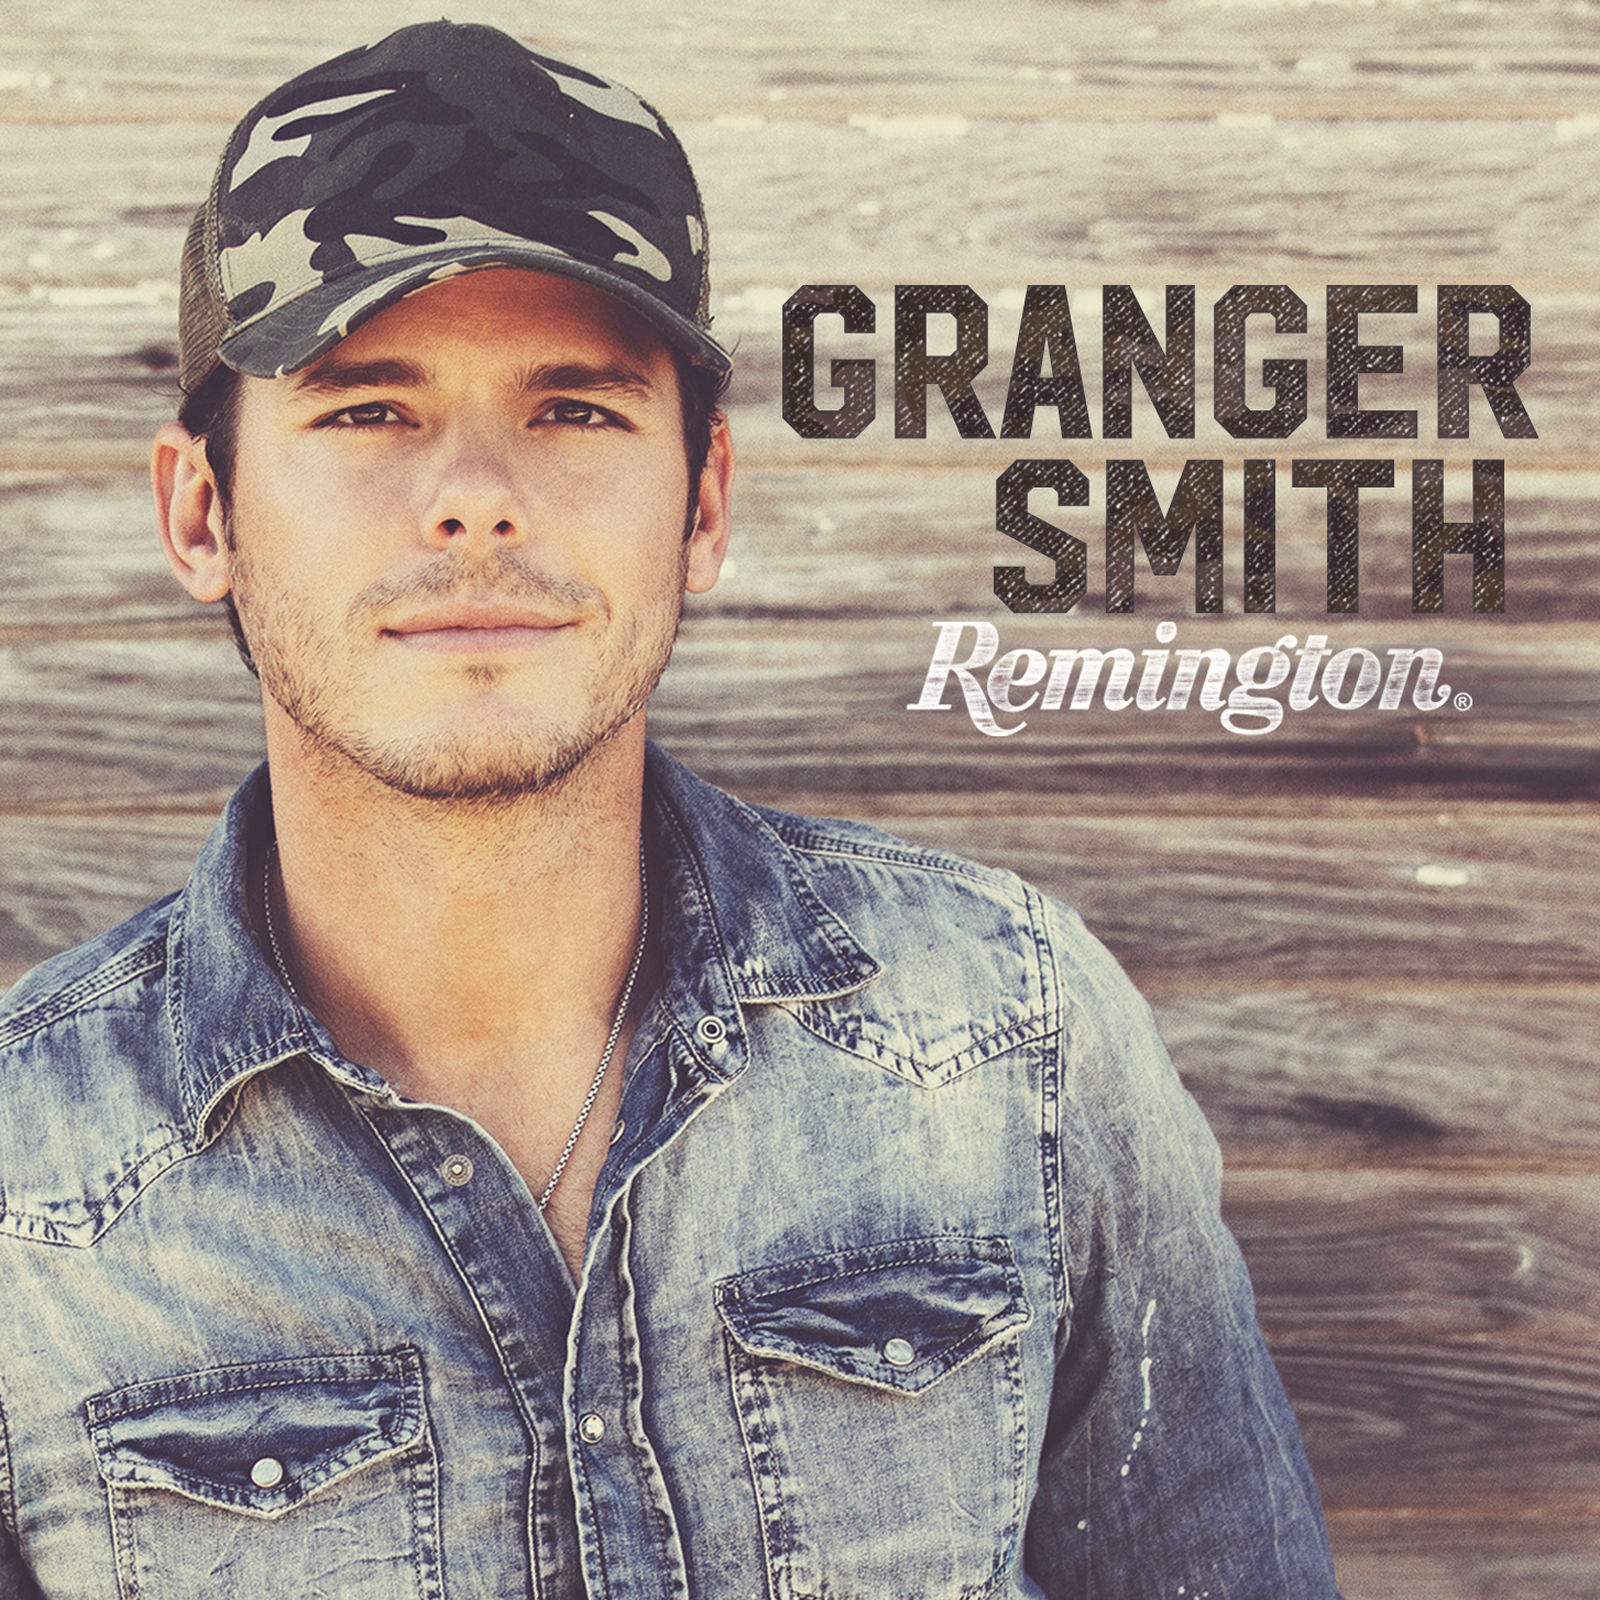 Granger Smith Announces New Album, 'Remington' | Sounds ...